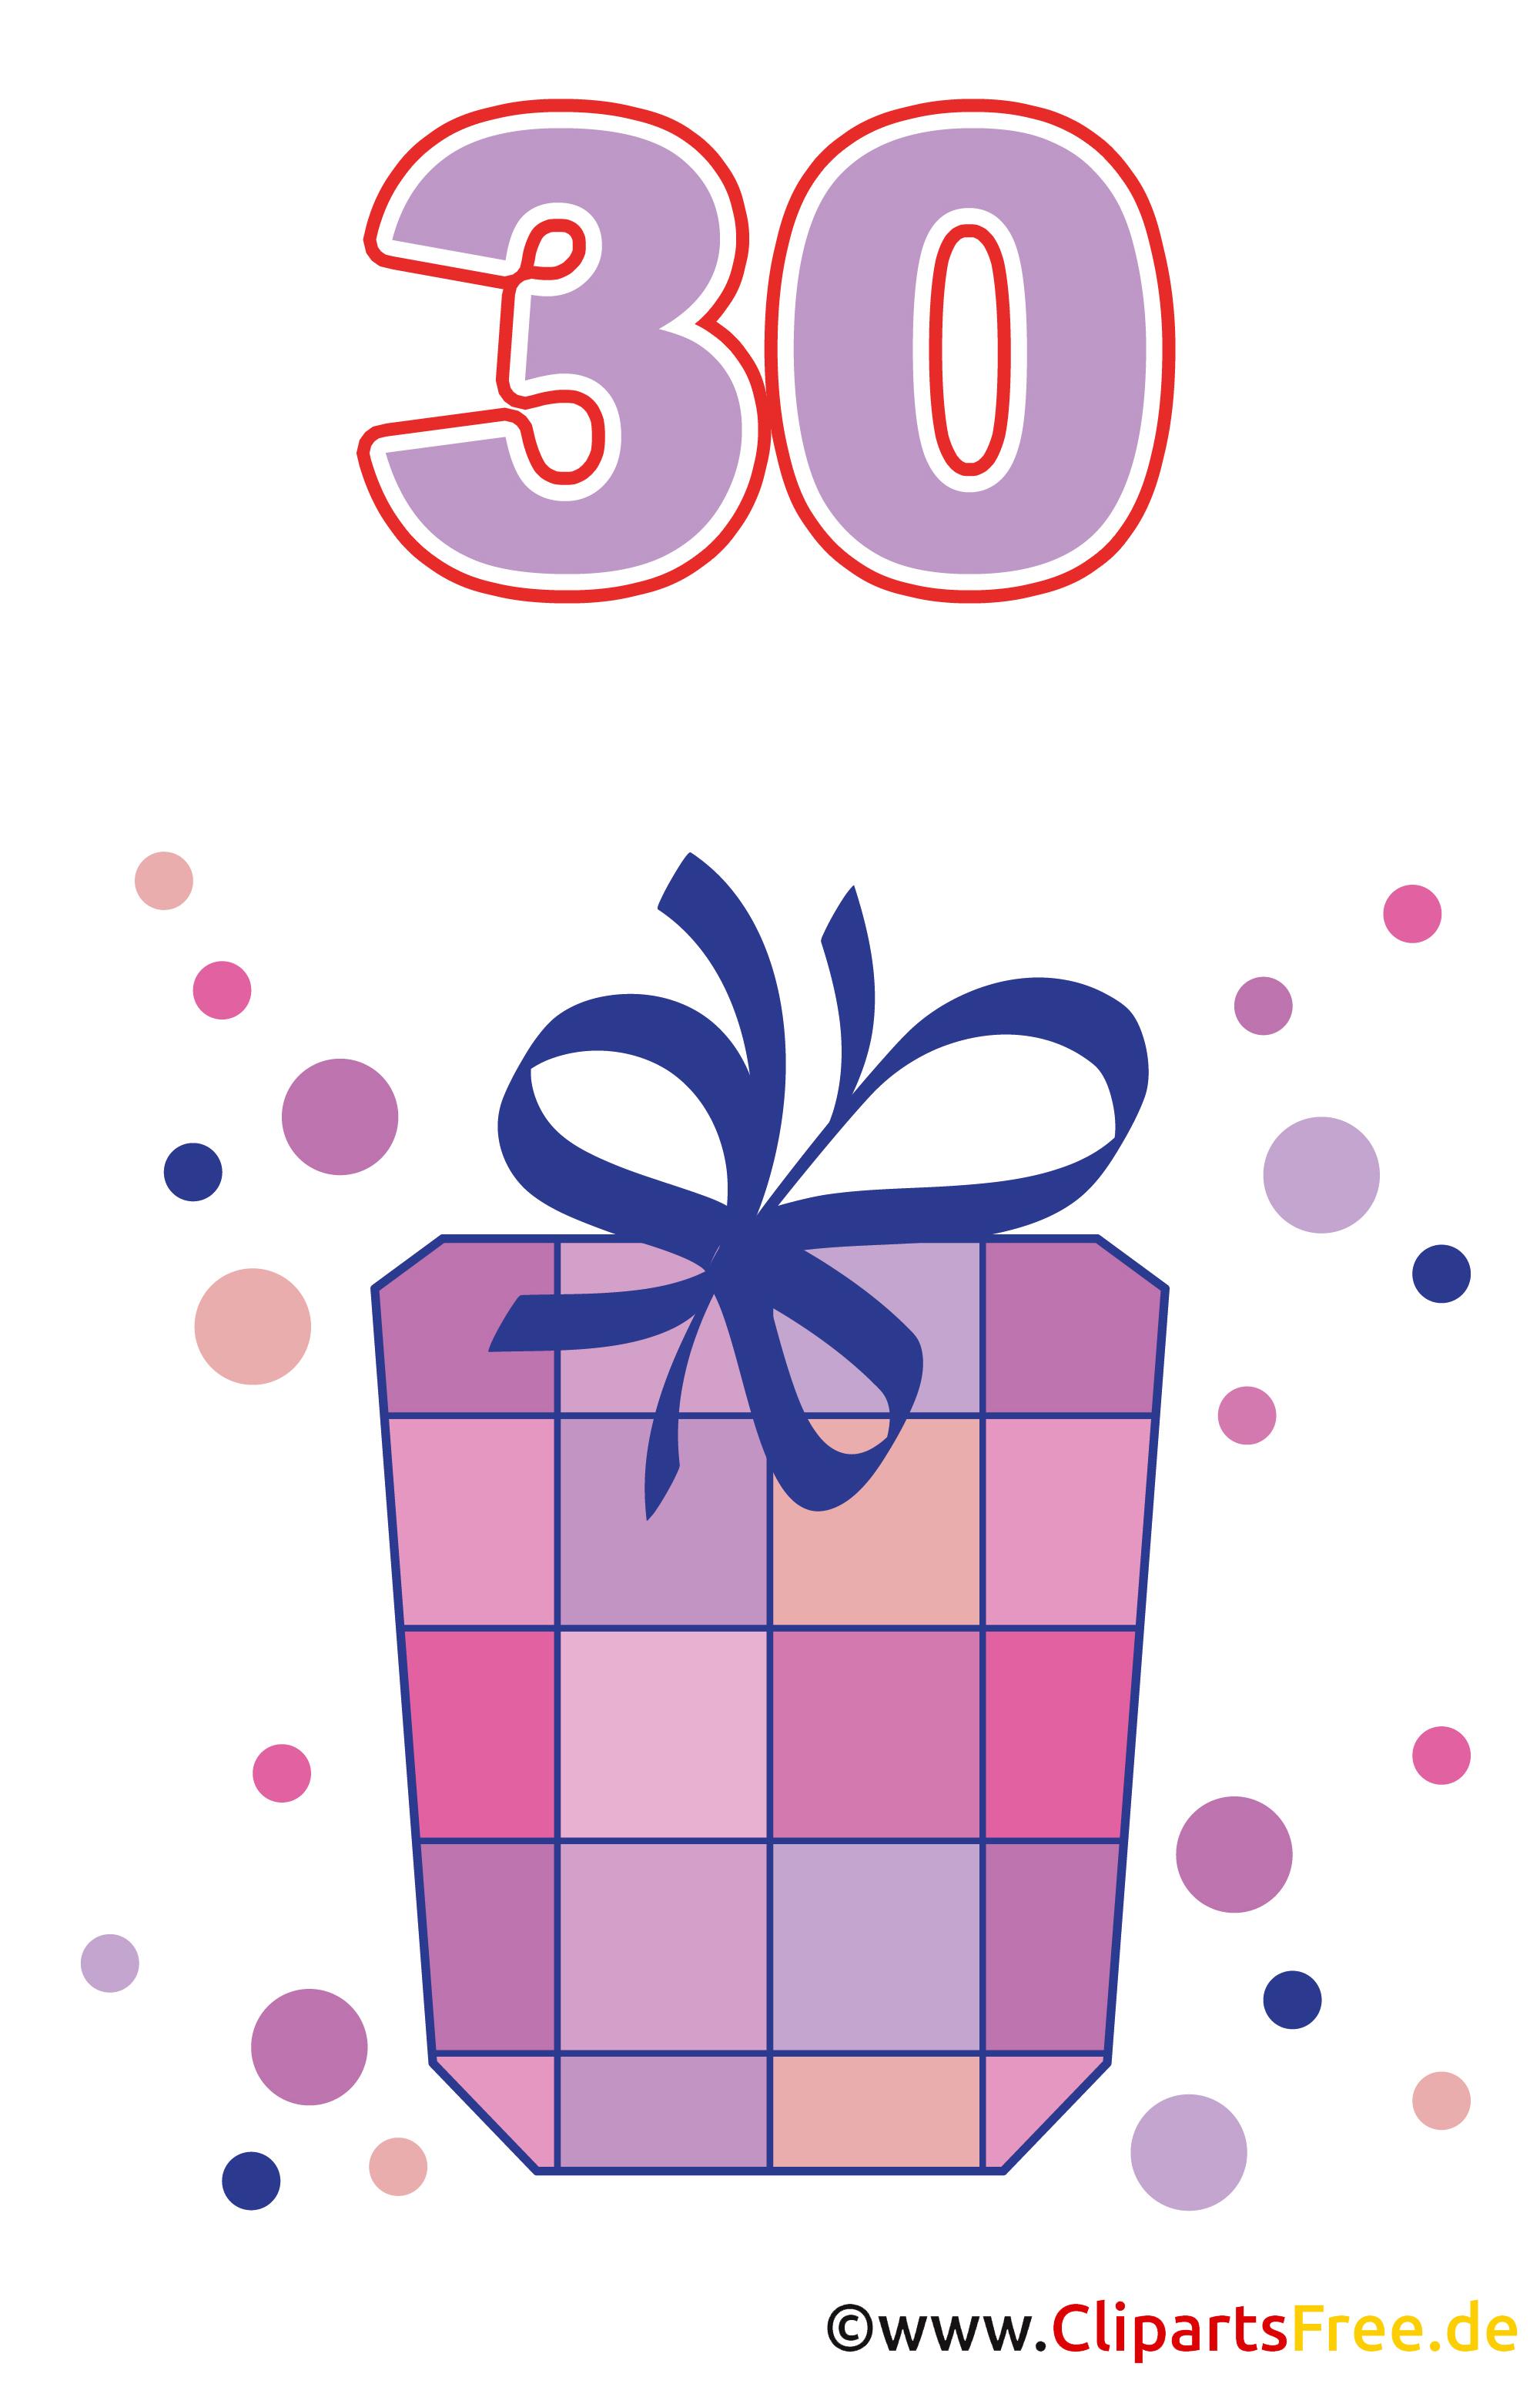 Geschenk zum 30 Geburtstag Clipart gratis